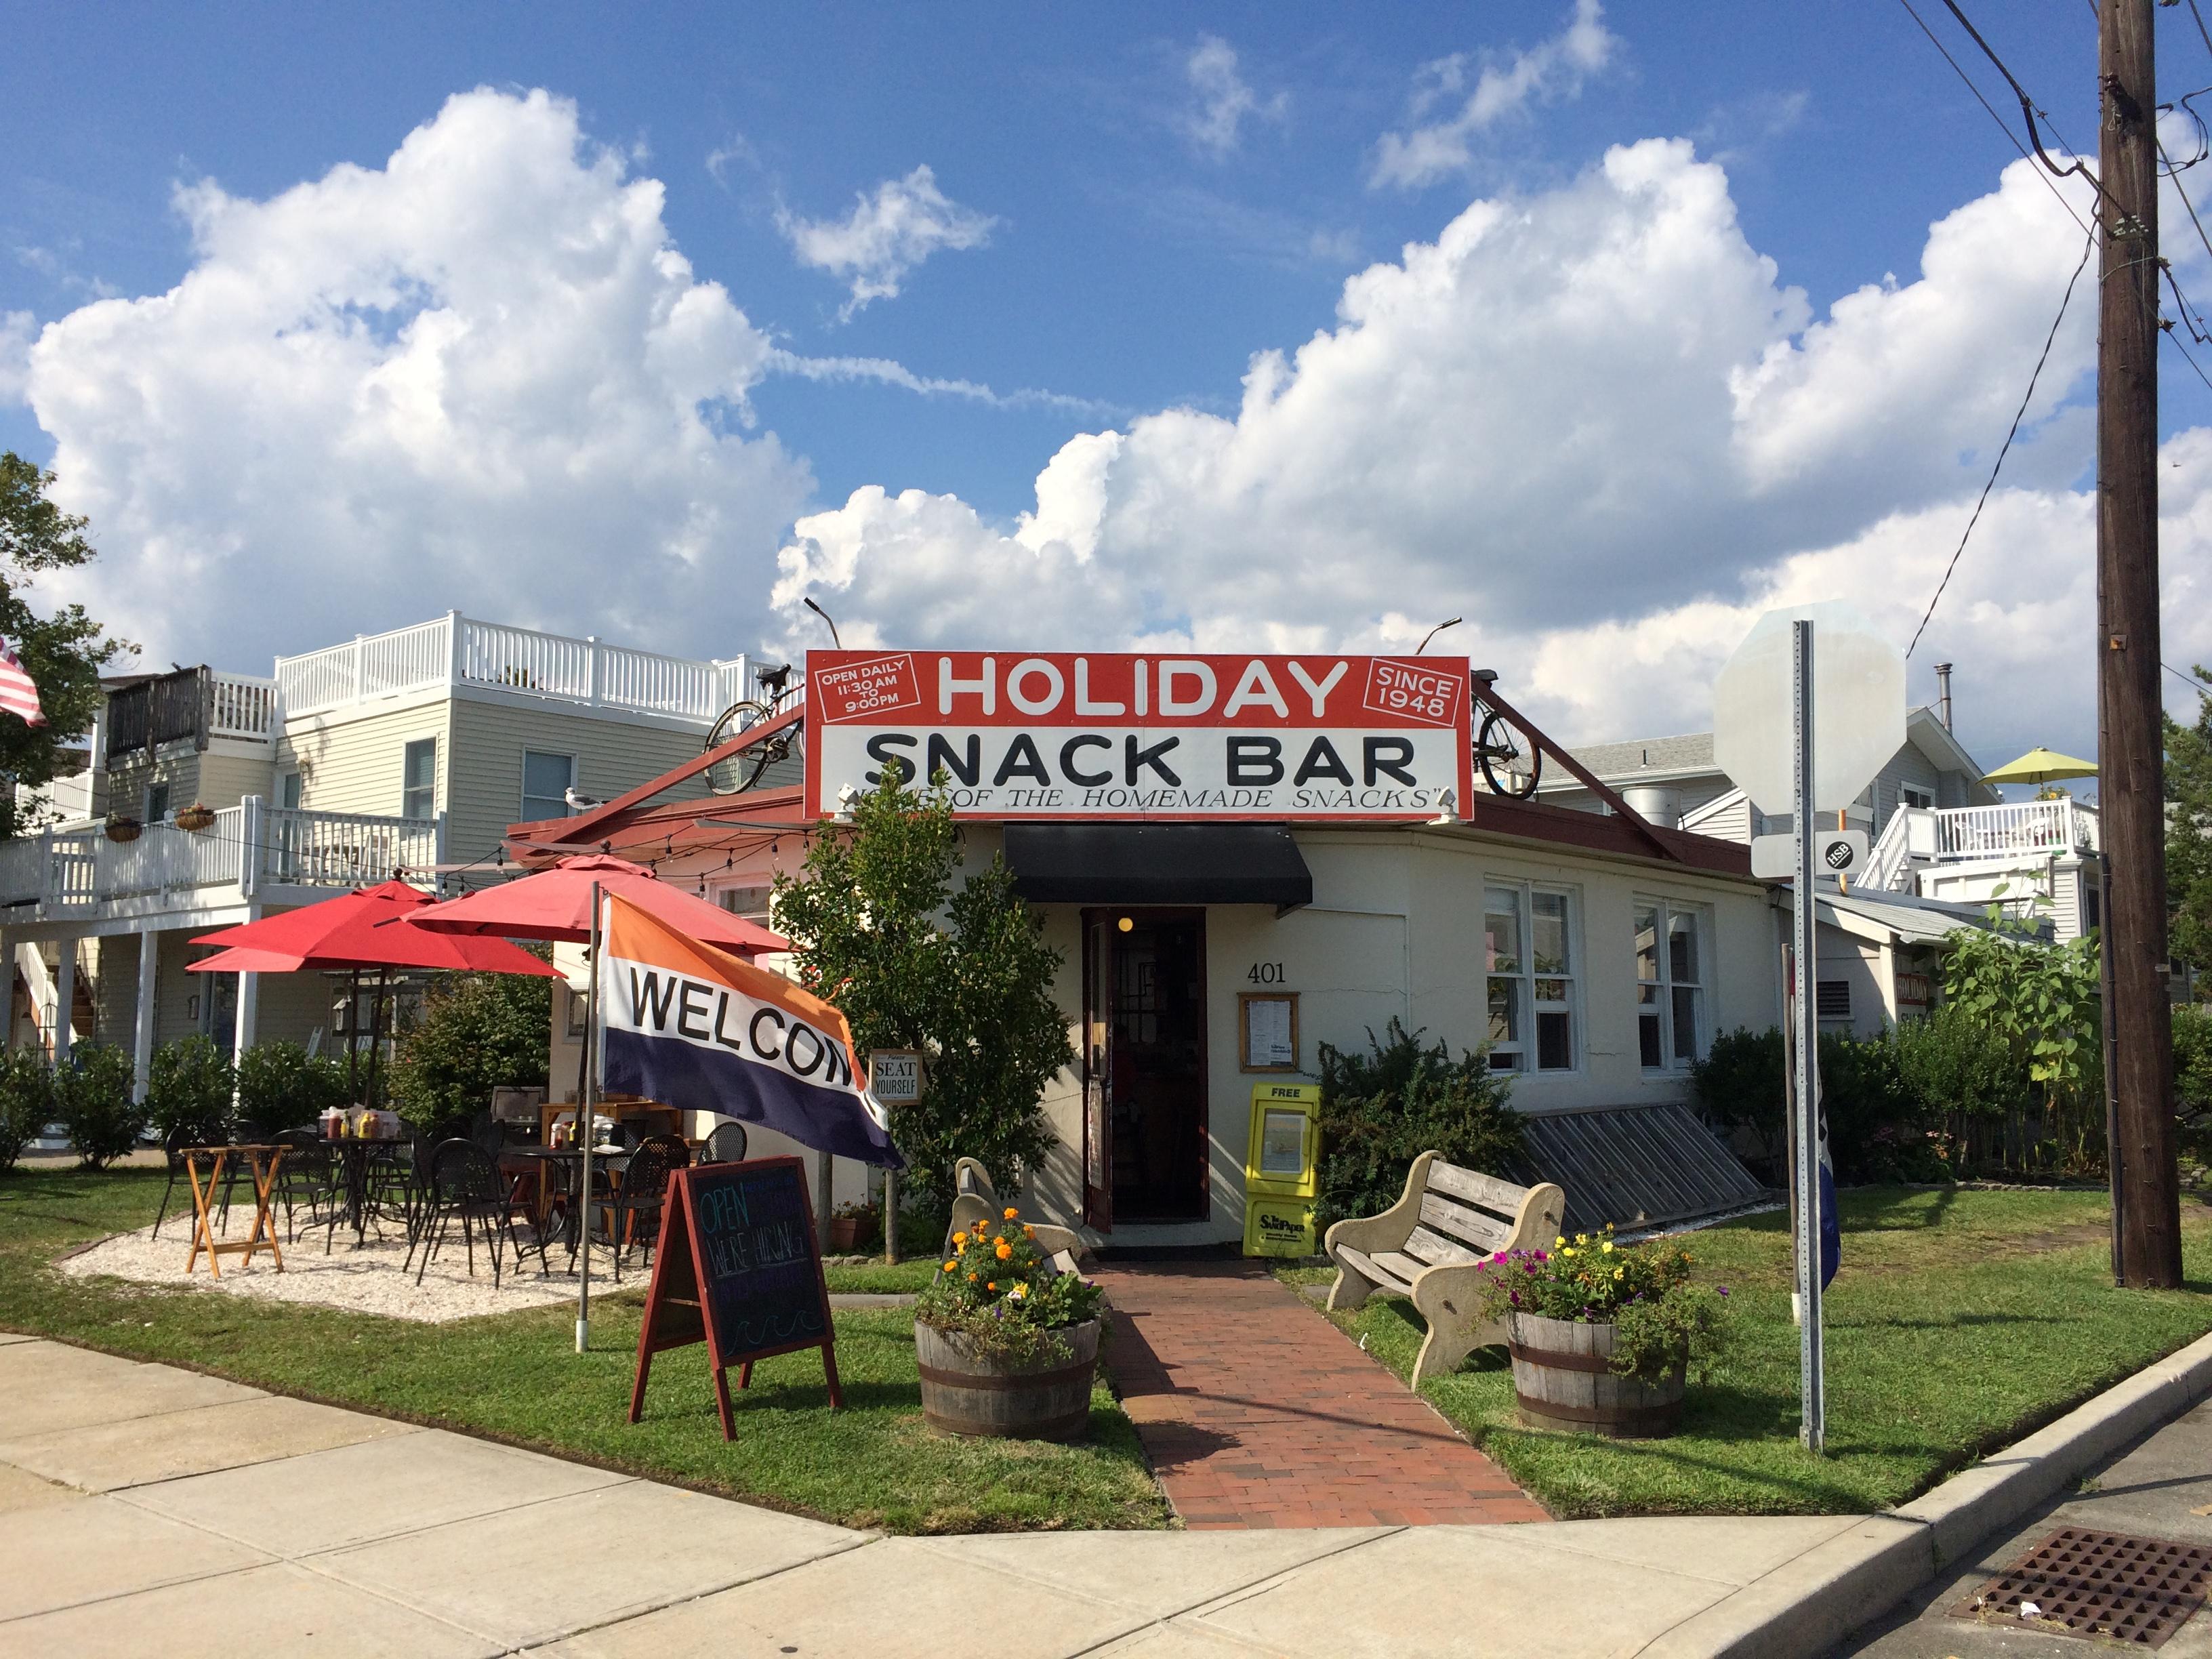 Holiday Snack Bar Beach Haven NJ LBI Retro Roadmap